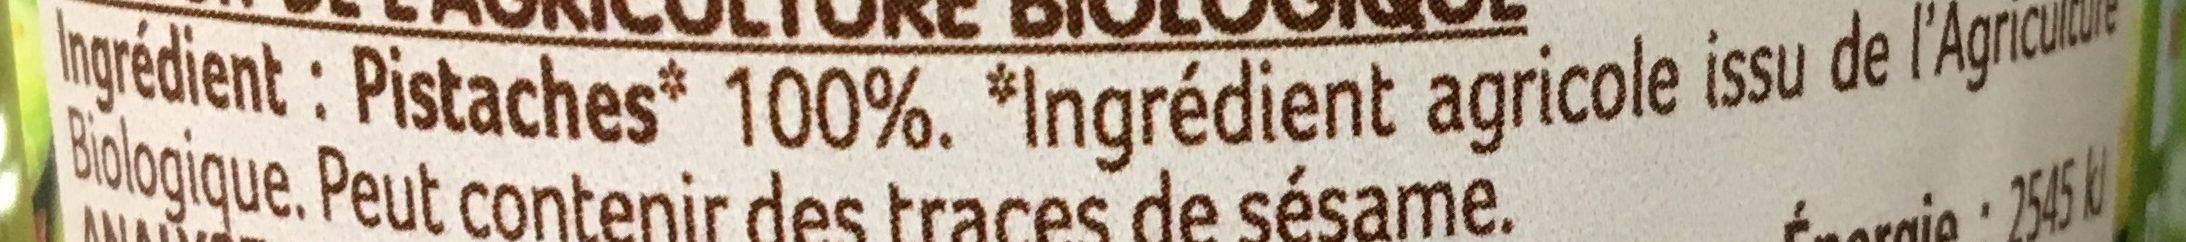 Purée de pistaches crue - Ingrediënten - fr